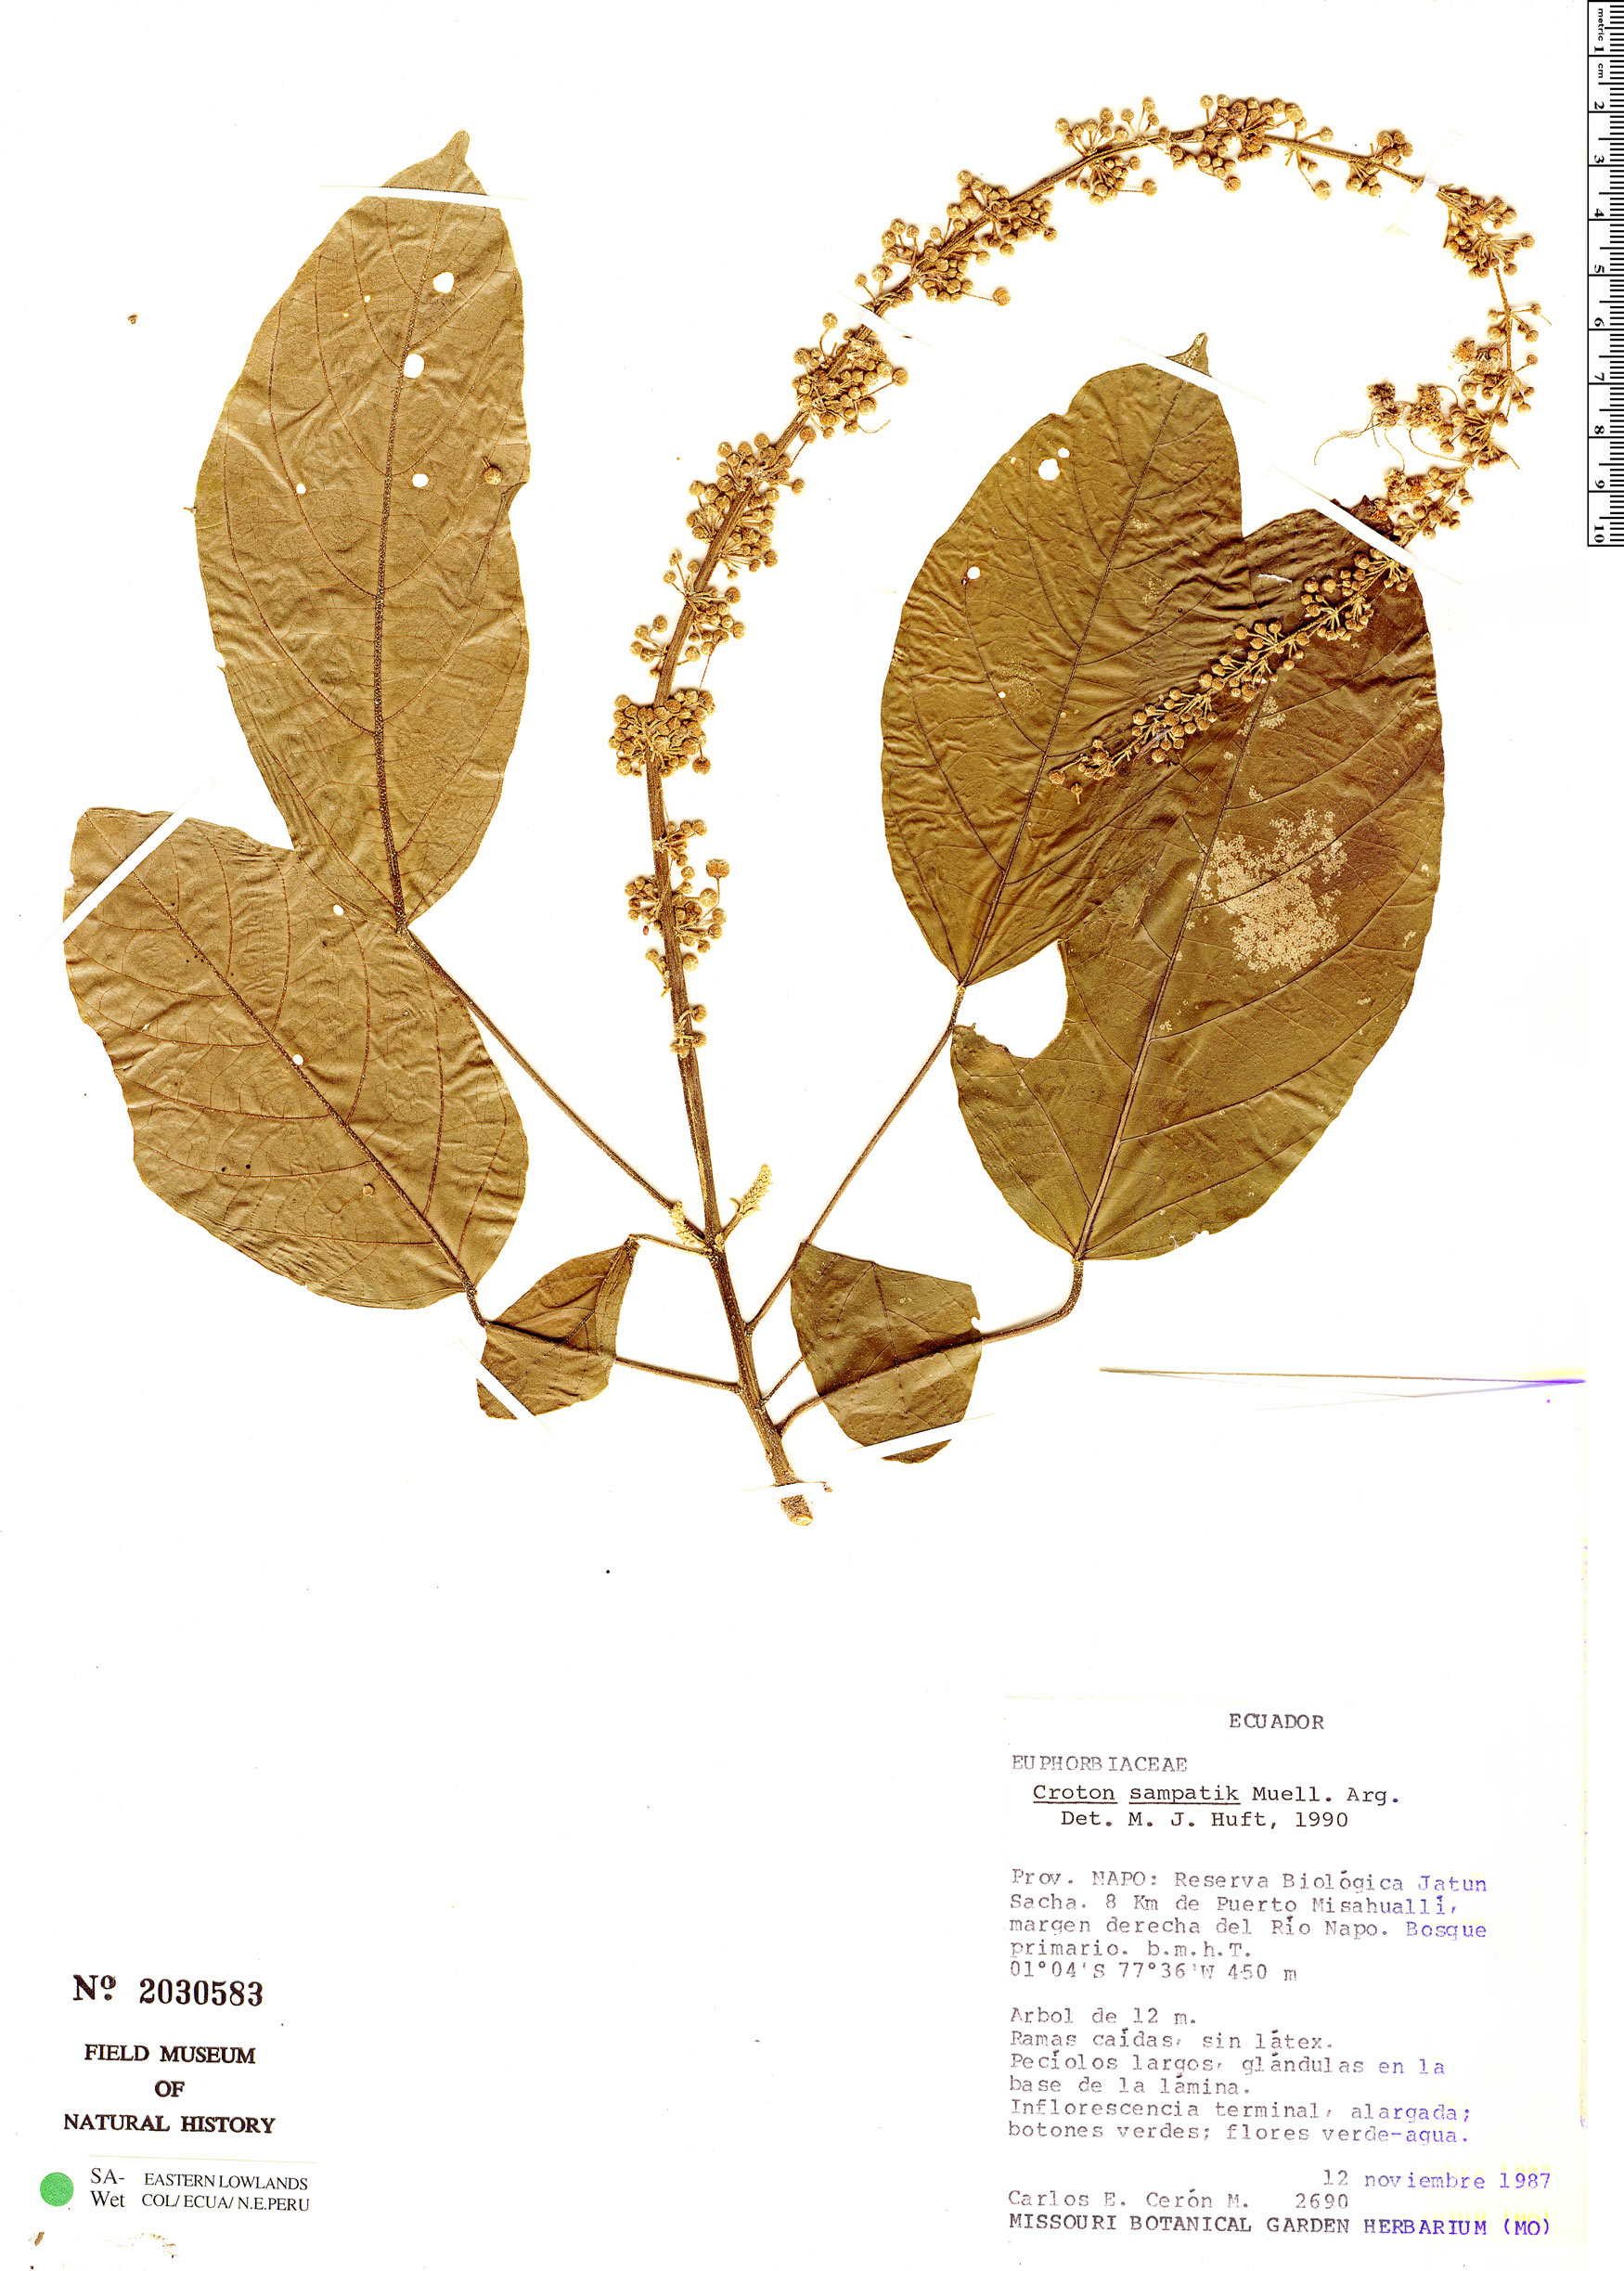 Specimen: Croton sampatik